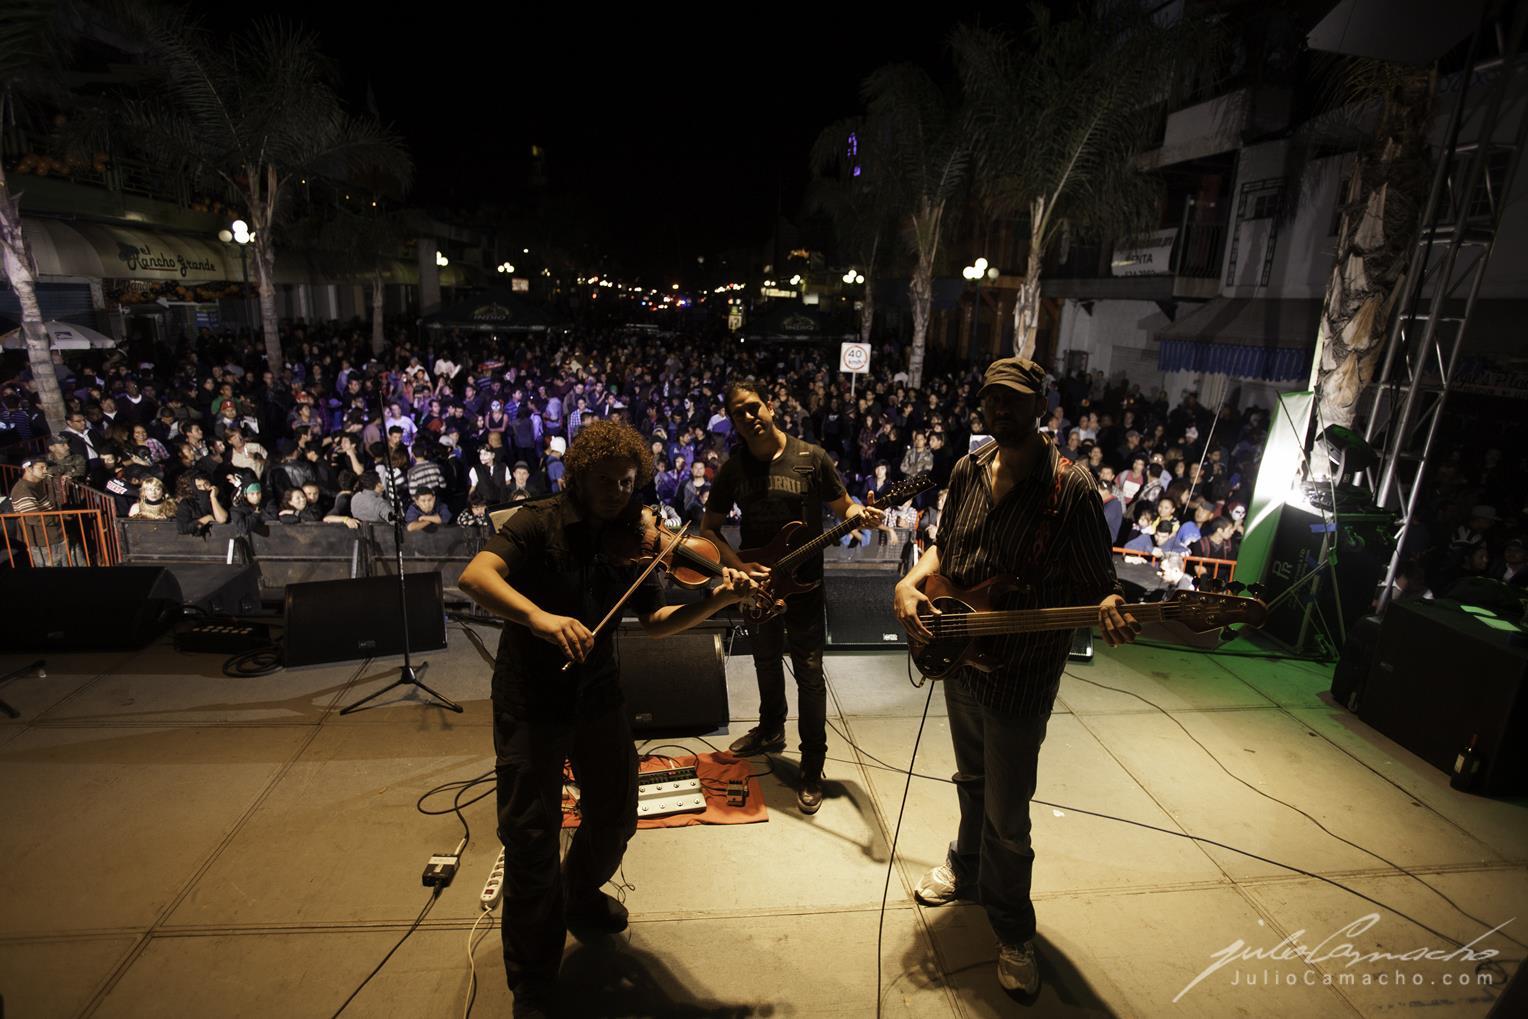 2014-10-30 31 CAST TOUR Ensenada y Tijuana - 1366 - www.Juli (Copy).jpg